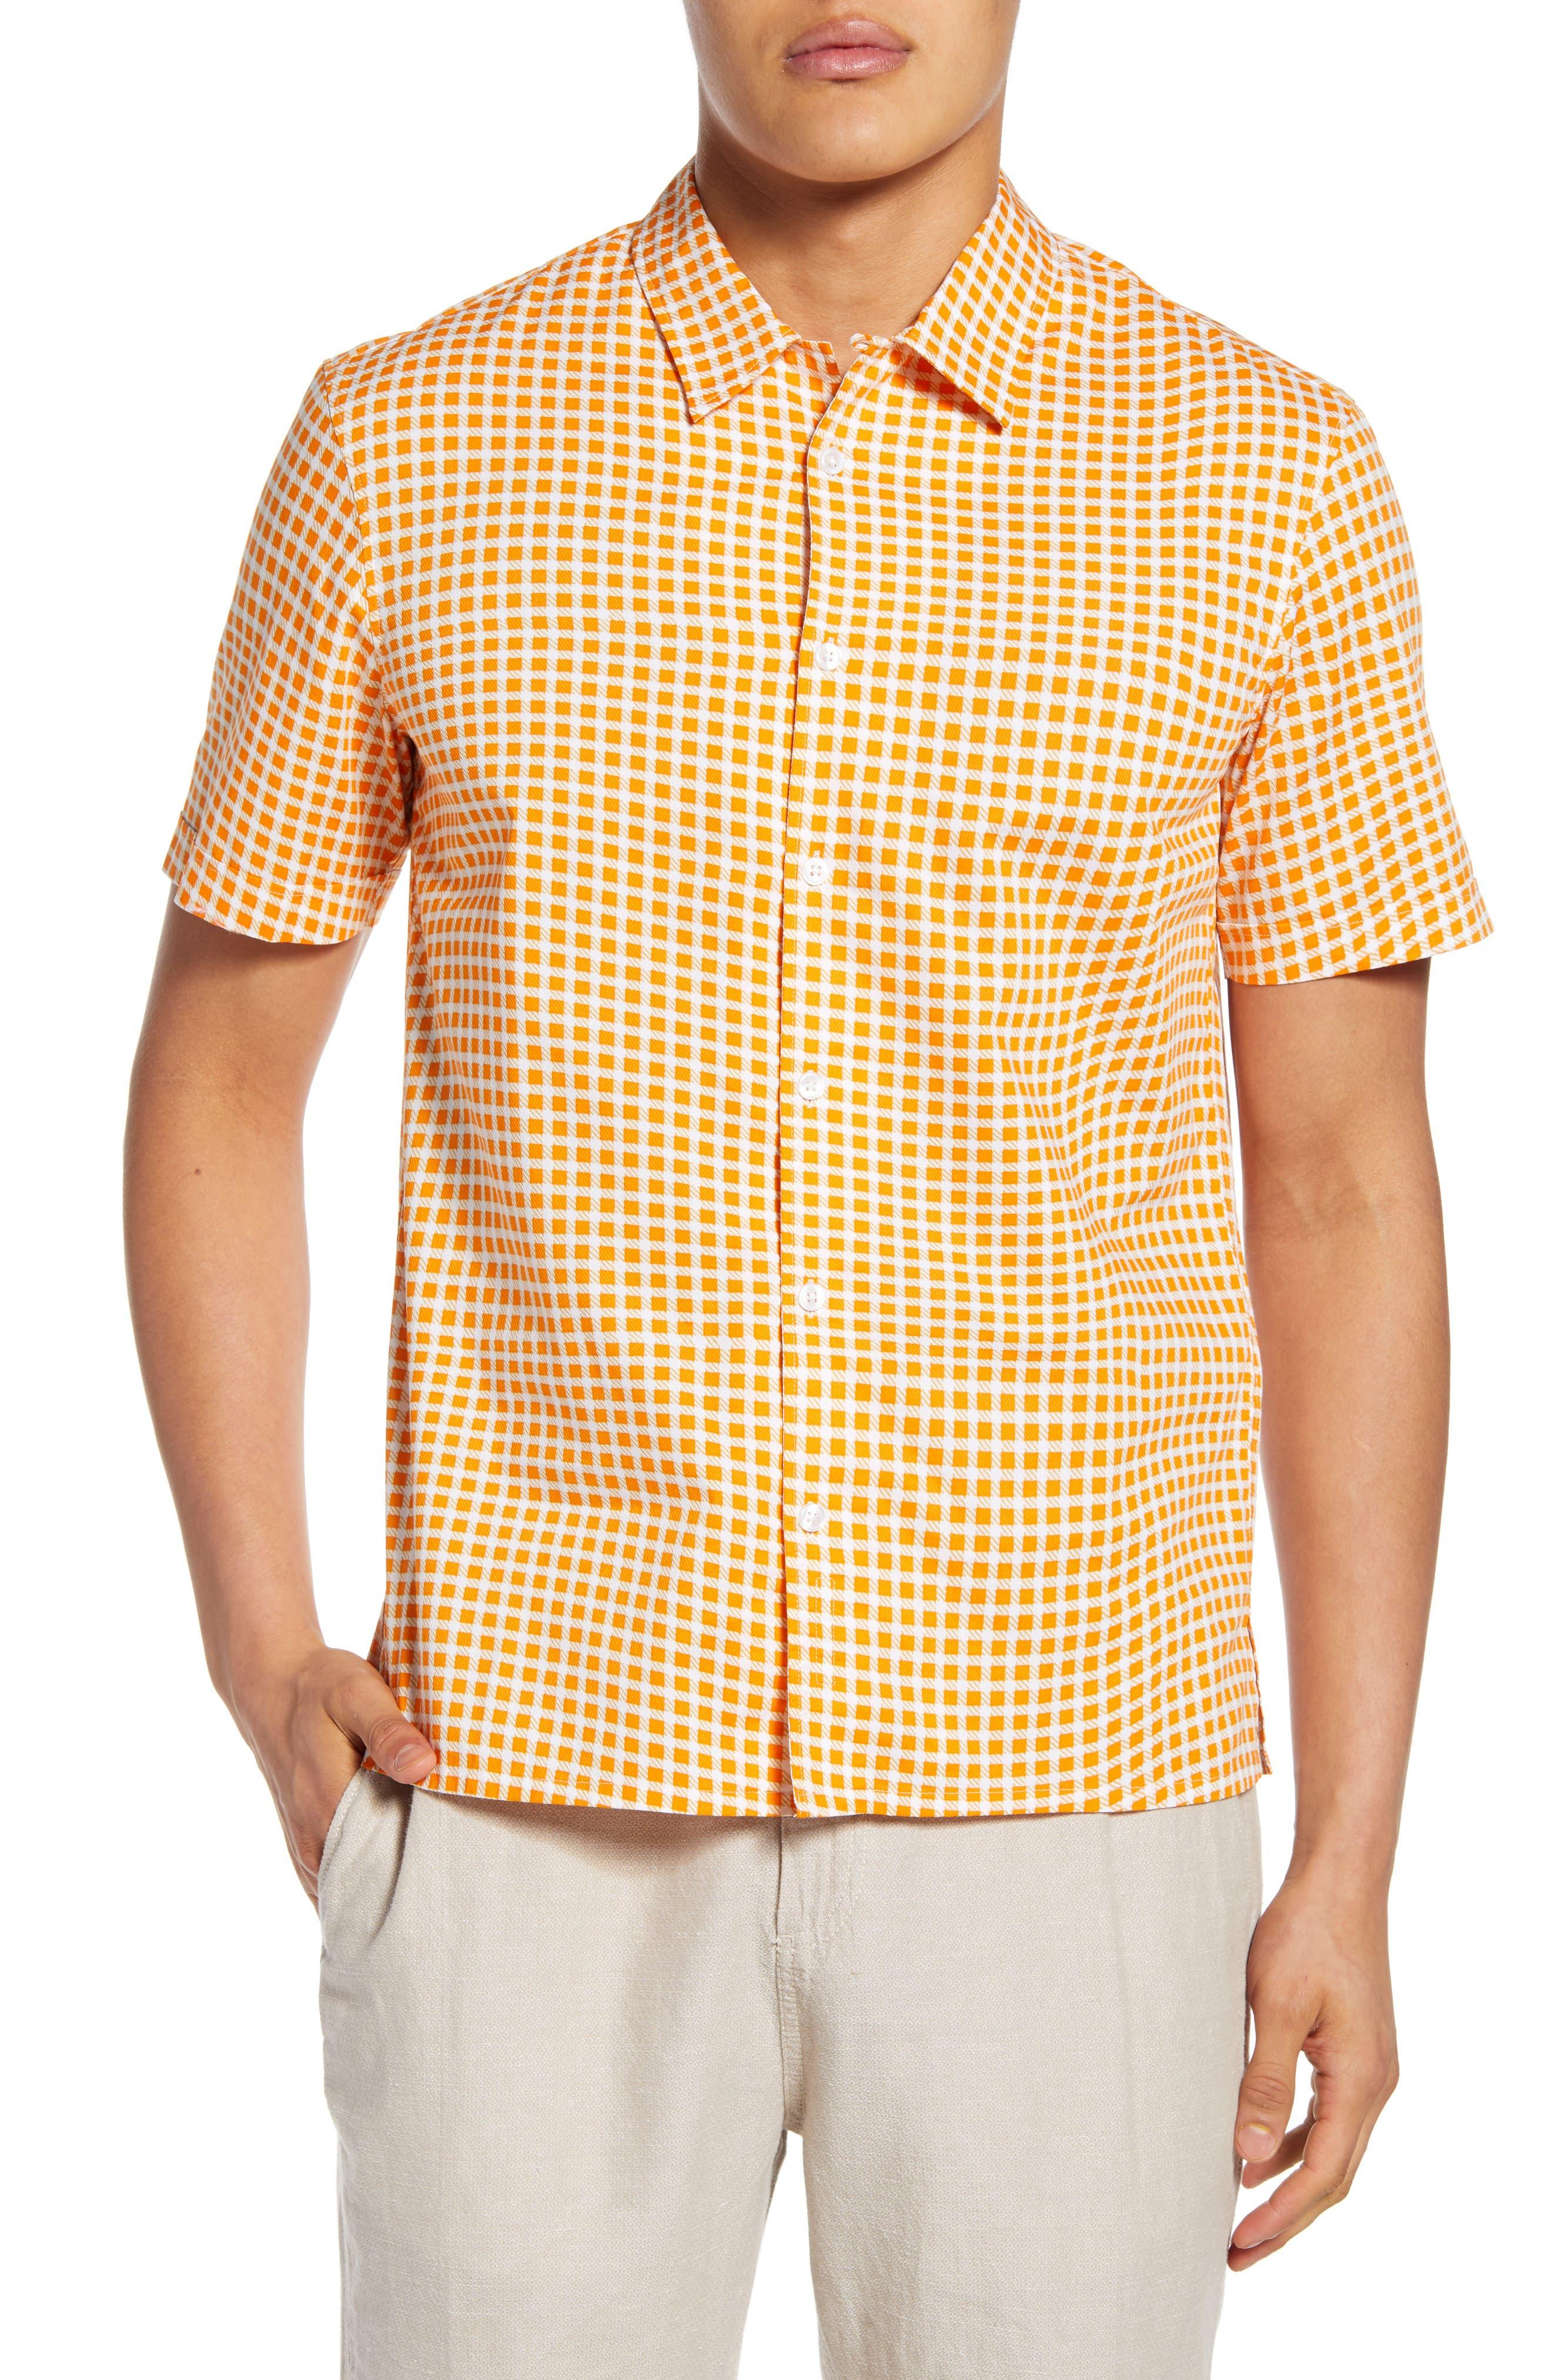 YUNY Men Turn-Down Collar Long-Sleeve Button Print Thicken T-Shirts Shirts AS24 XL